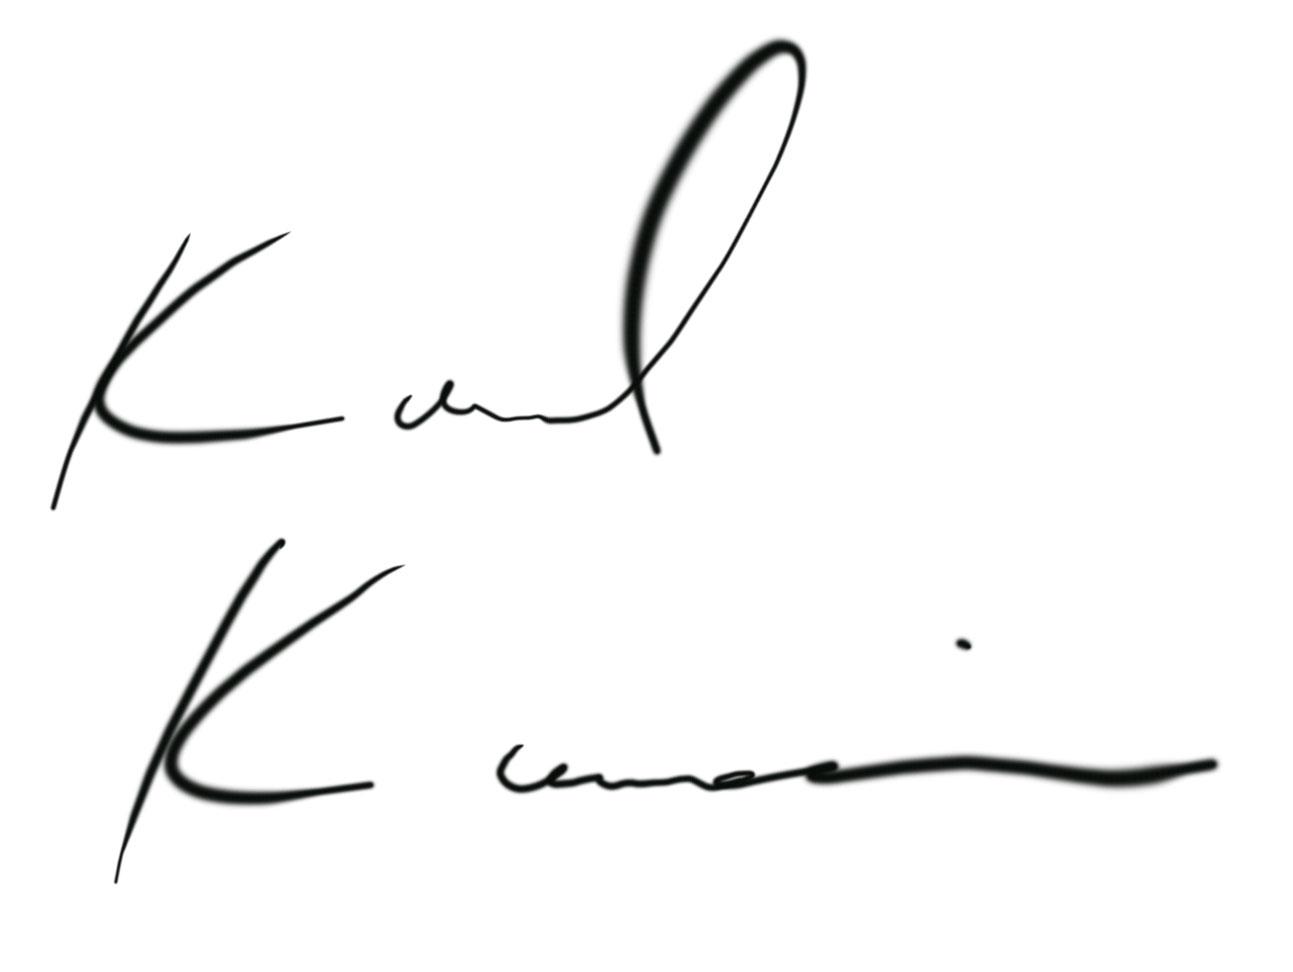 Karl Kanai Signature